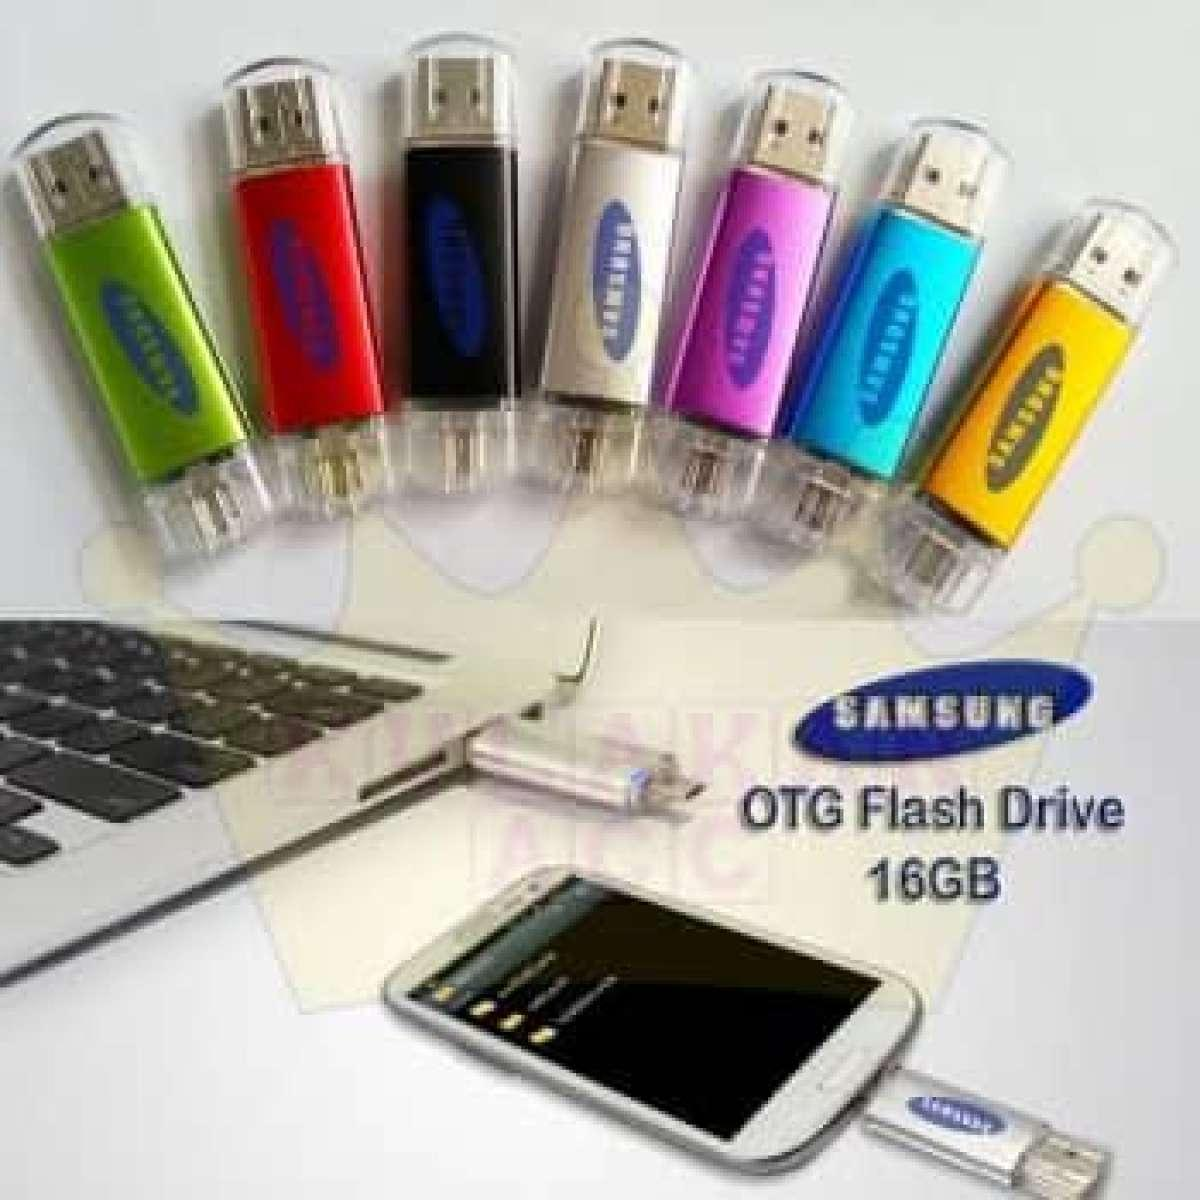 Jual Flashdisk Terbaru Flasdisk Hp 8gb V250w Otg Samsung 16 Gb Random Warna Sas